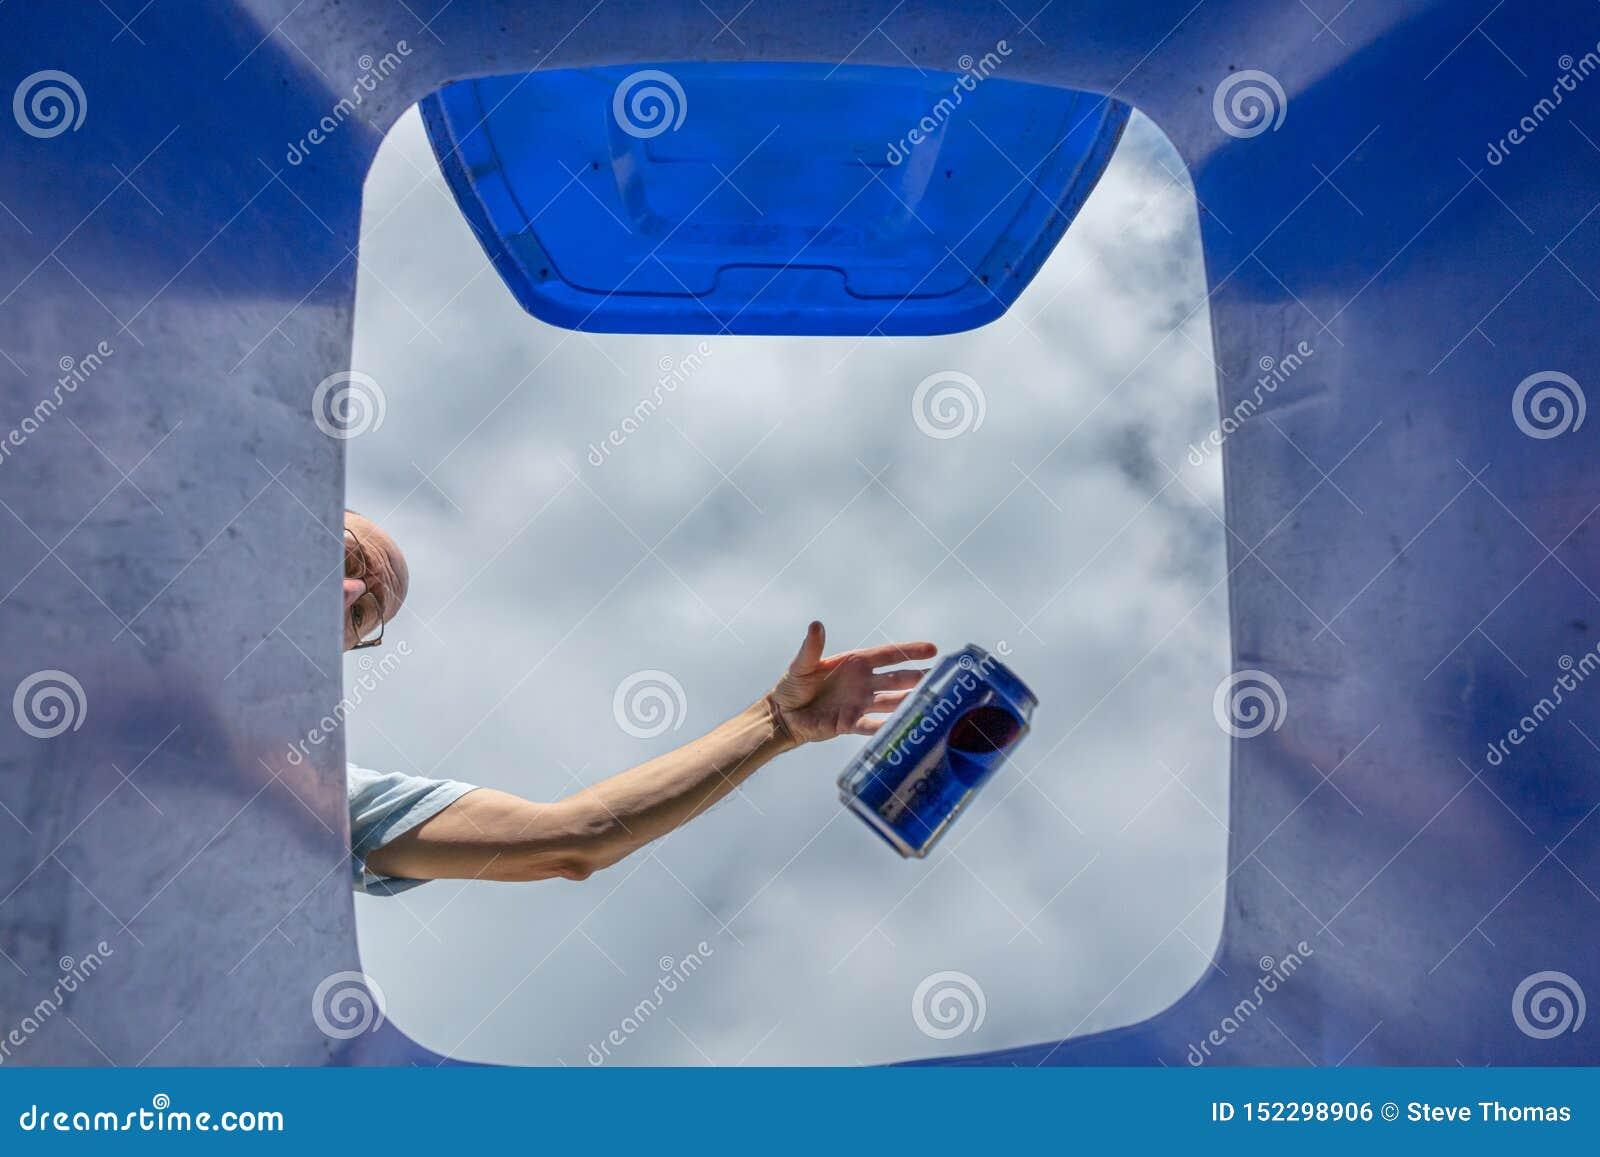 De mens die frisdrank laten vallen kan in blauwe recyclings wheelie bak